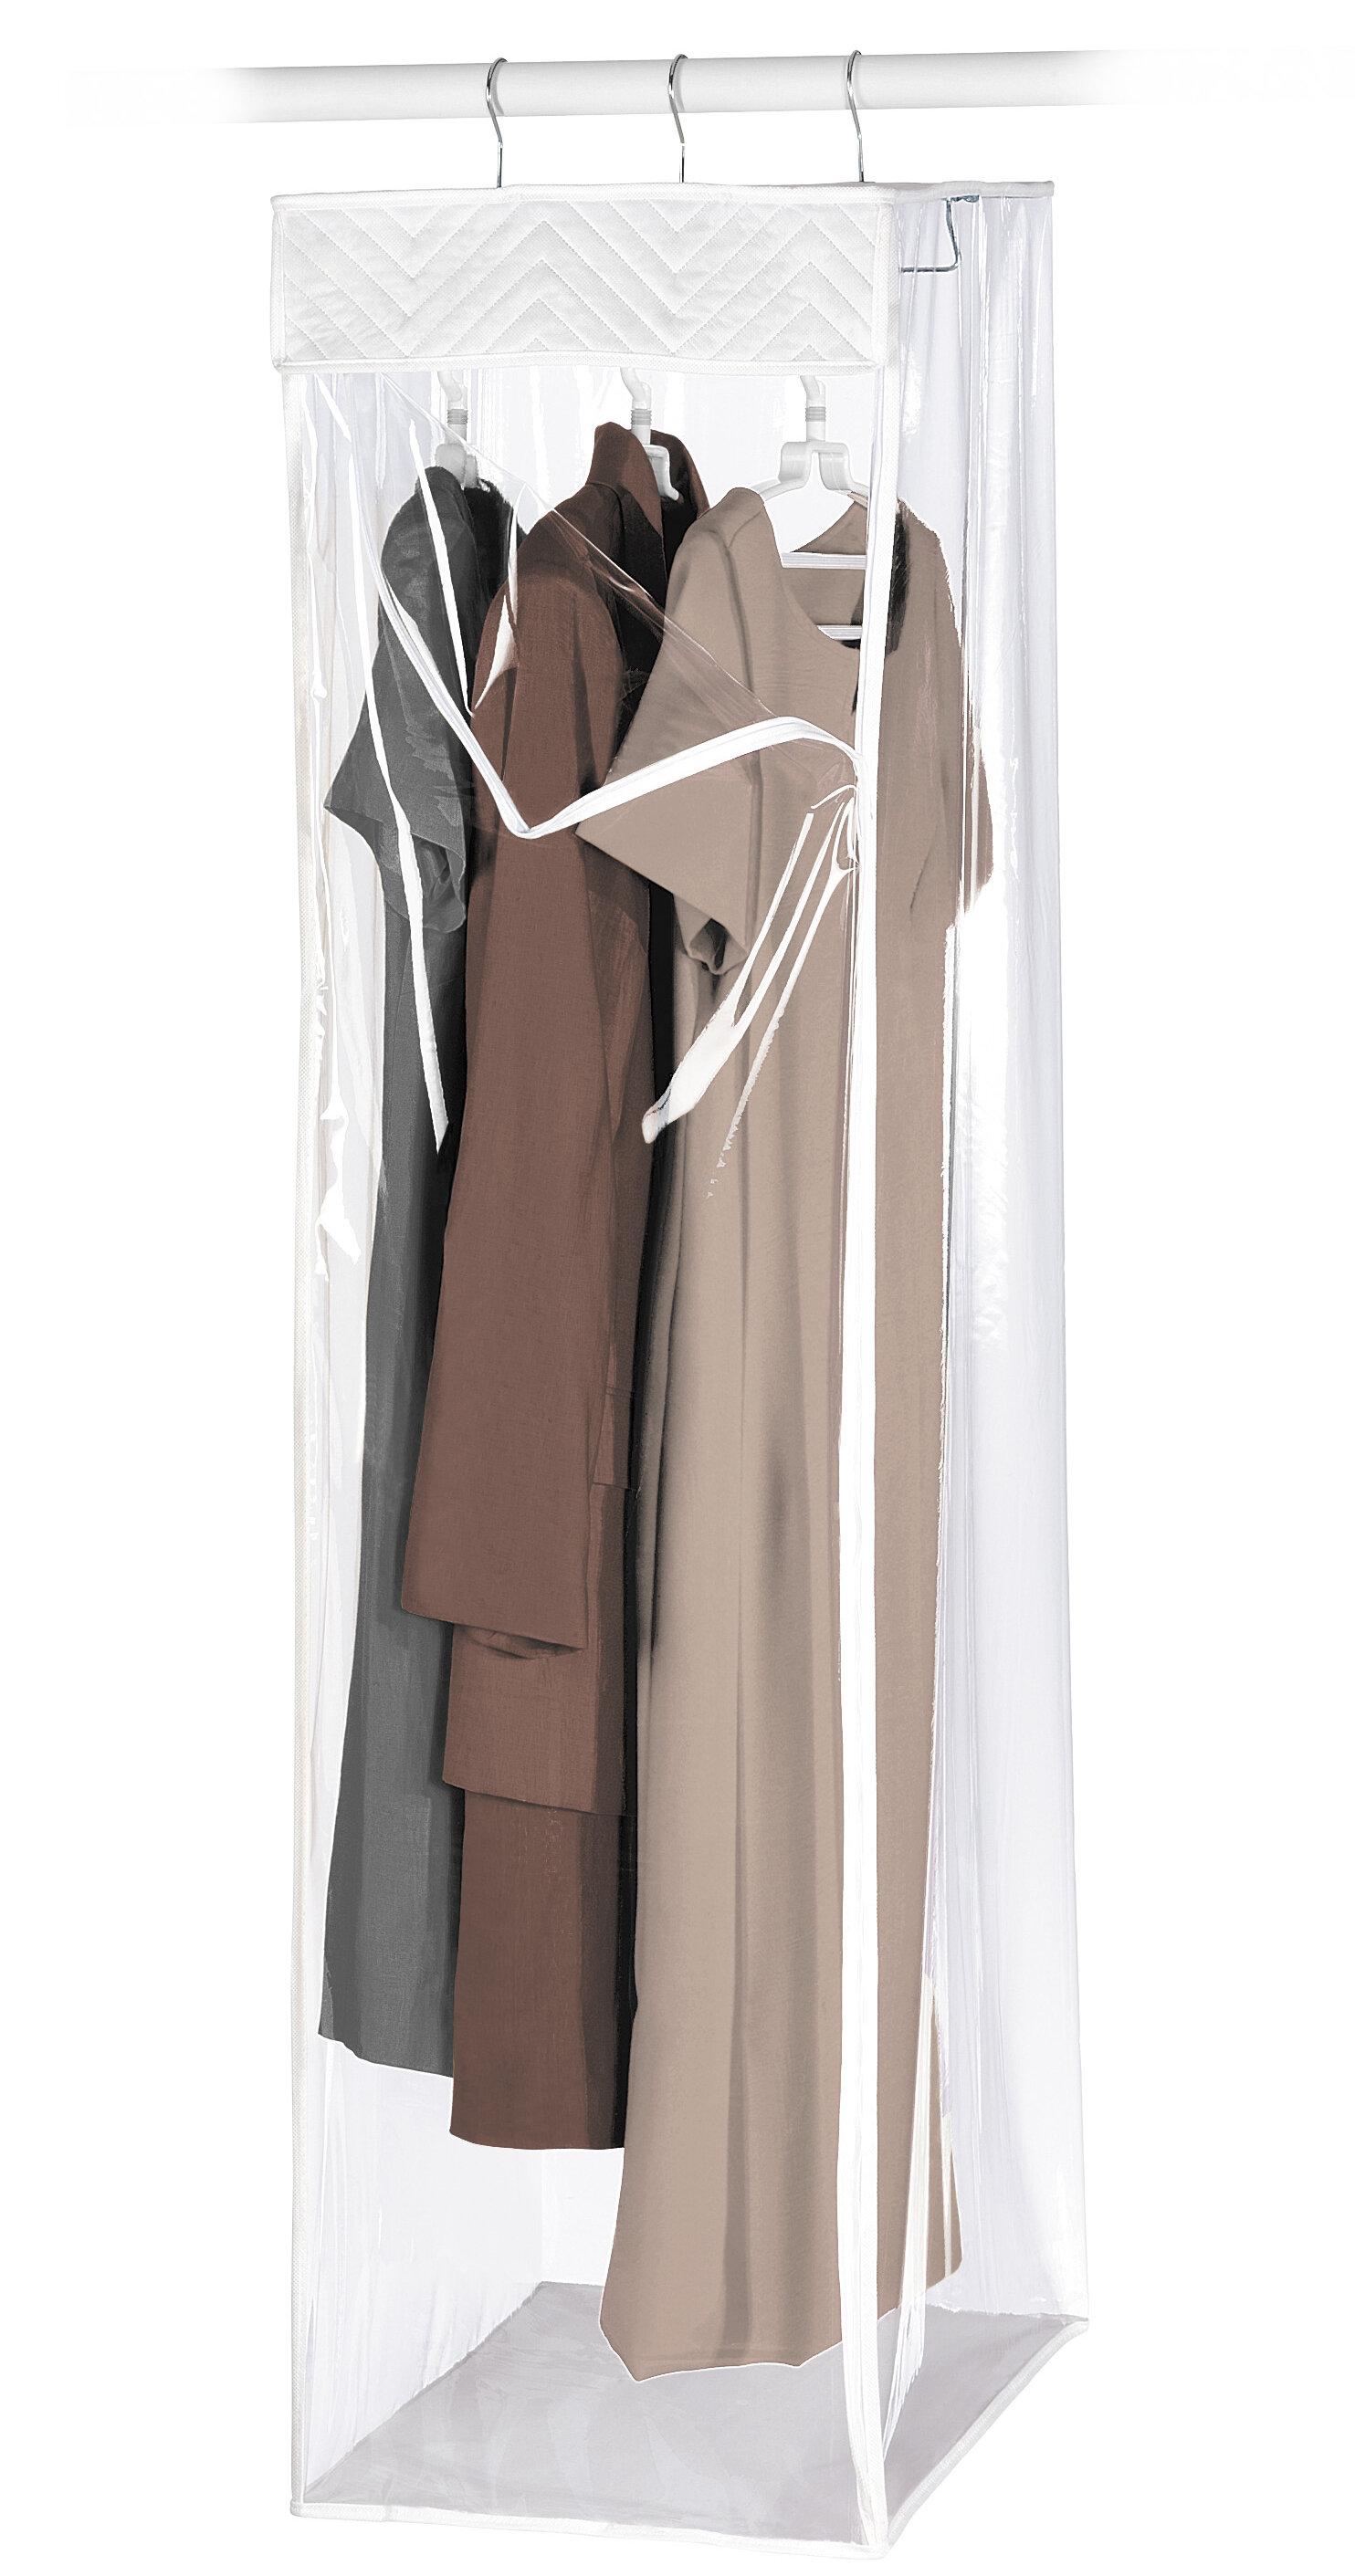 Hanging Garment Bag Garment Bag Blush Pink Medallion